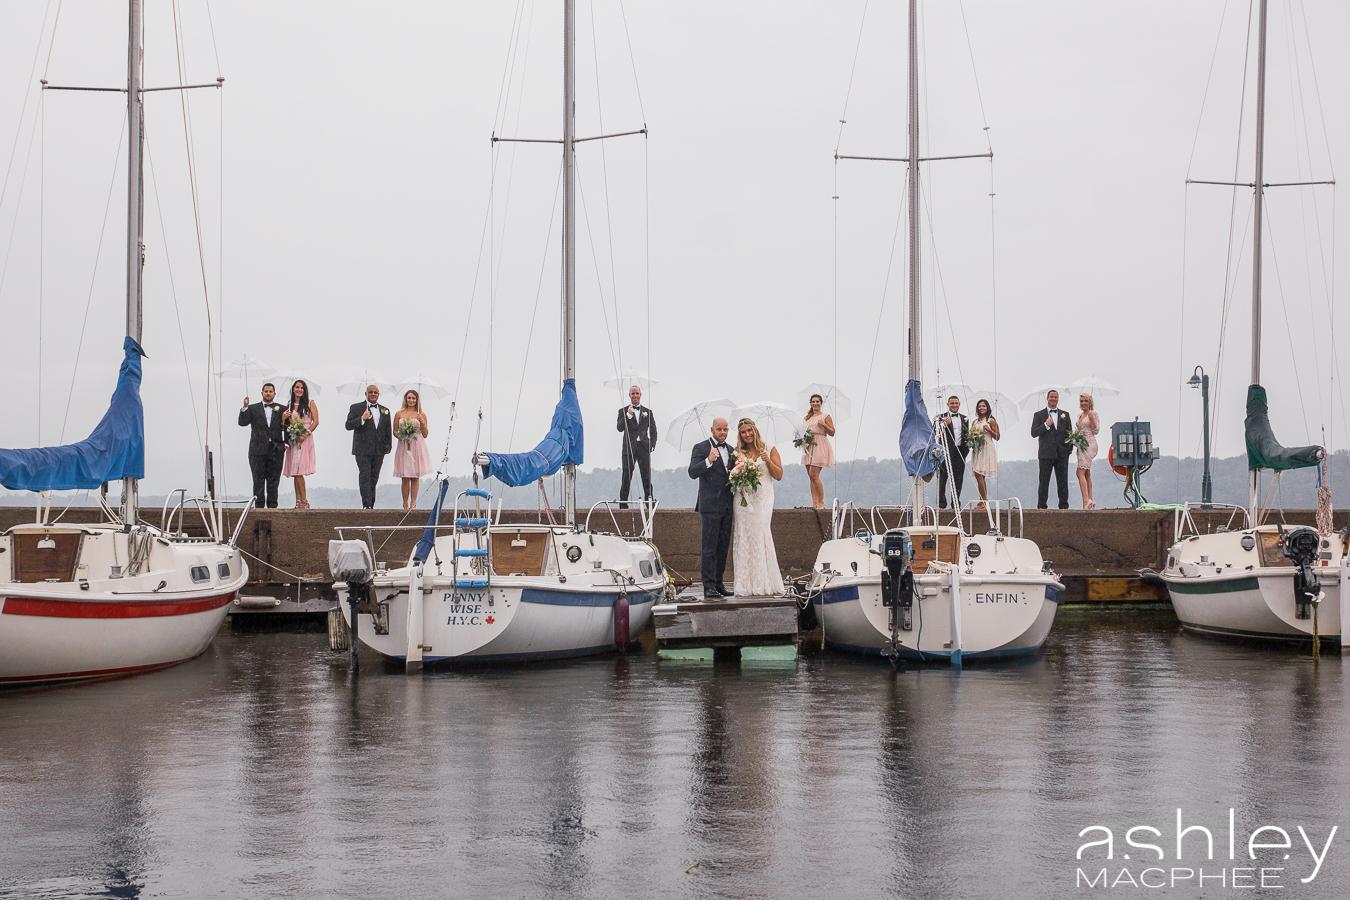 Ashley MacPhee Photography Hudson Yacht Club wedding photographer (64 of 112).jpg